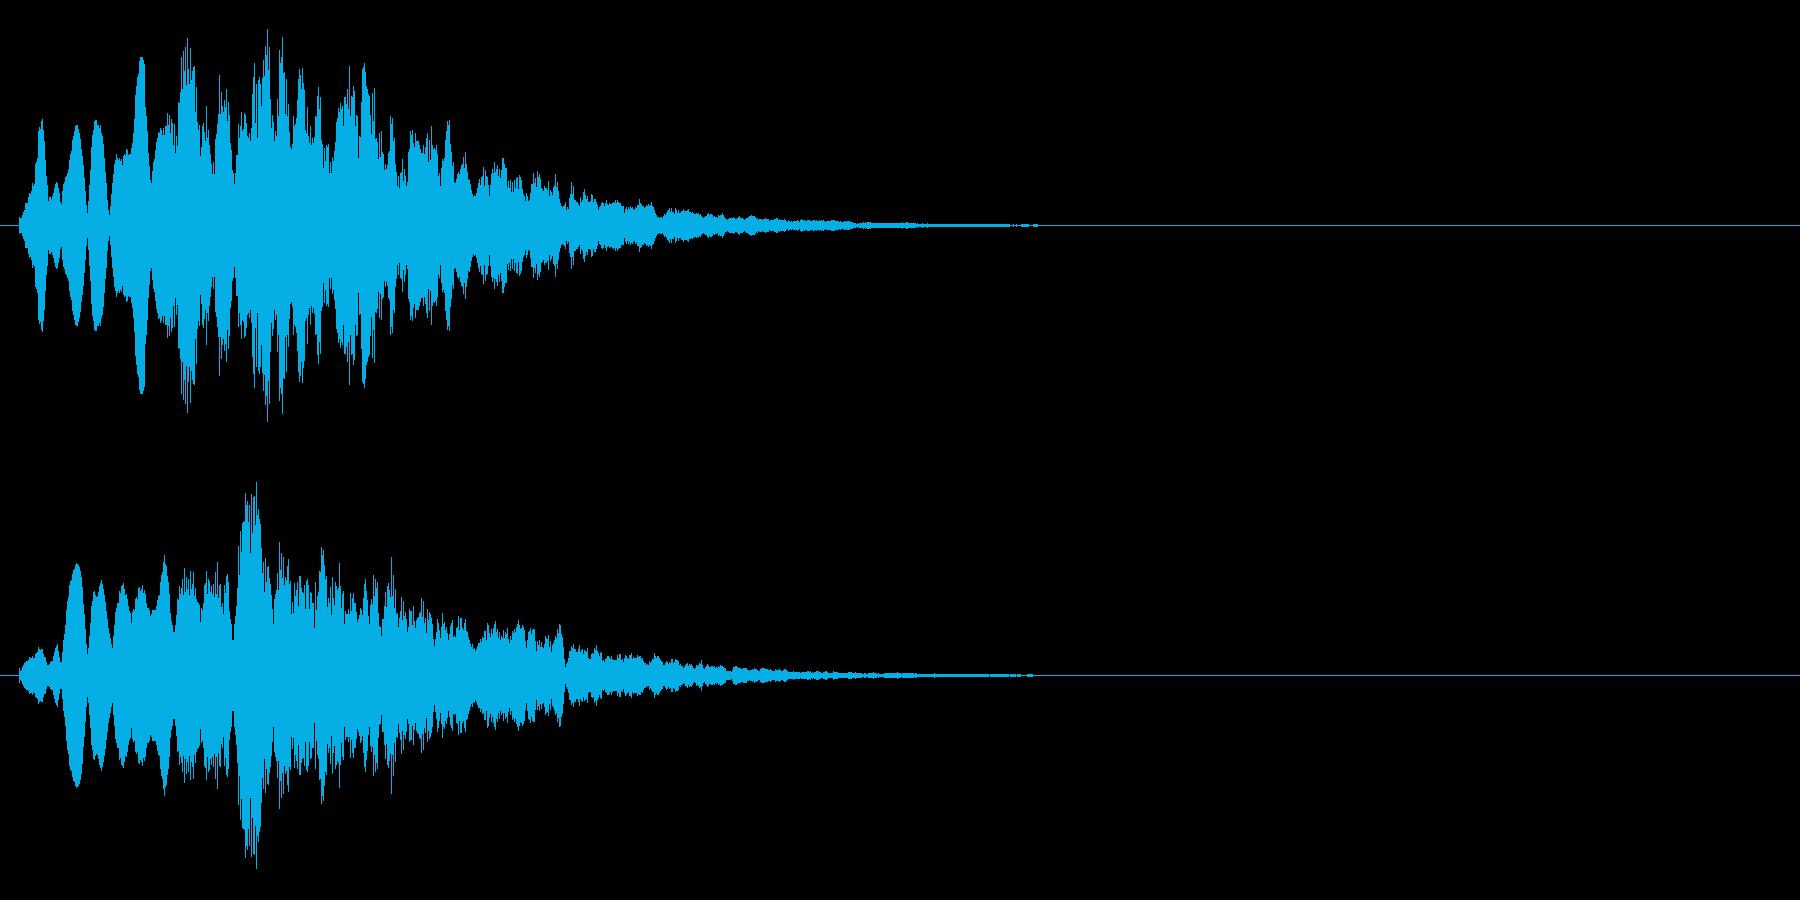 不思議 幻想 宇宙 神秘 深海 科学の再生済みの波形